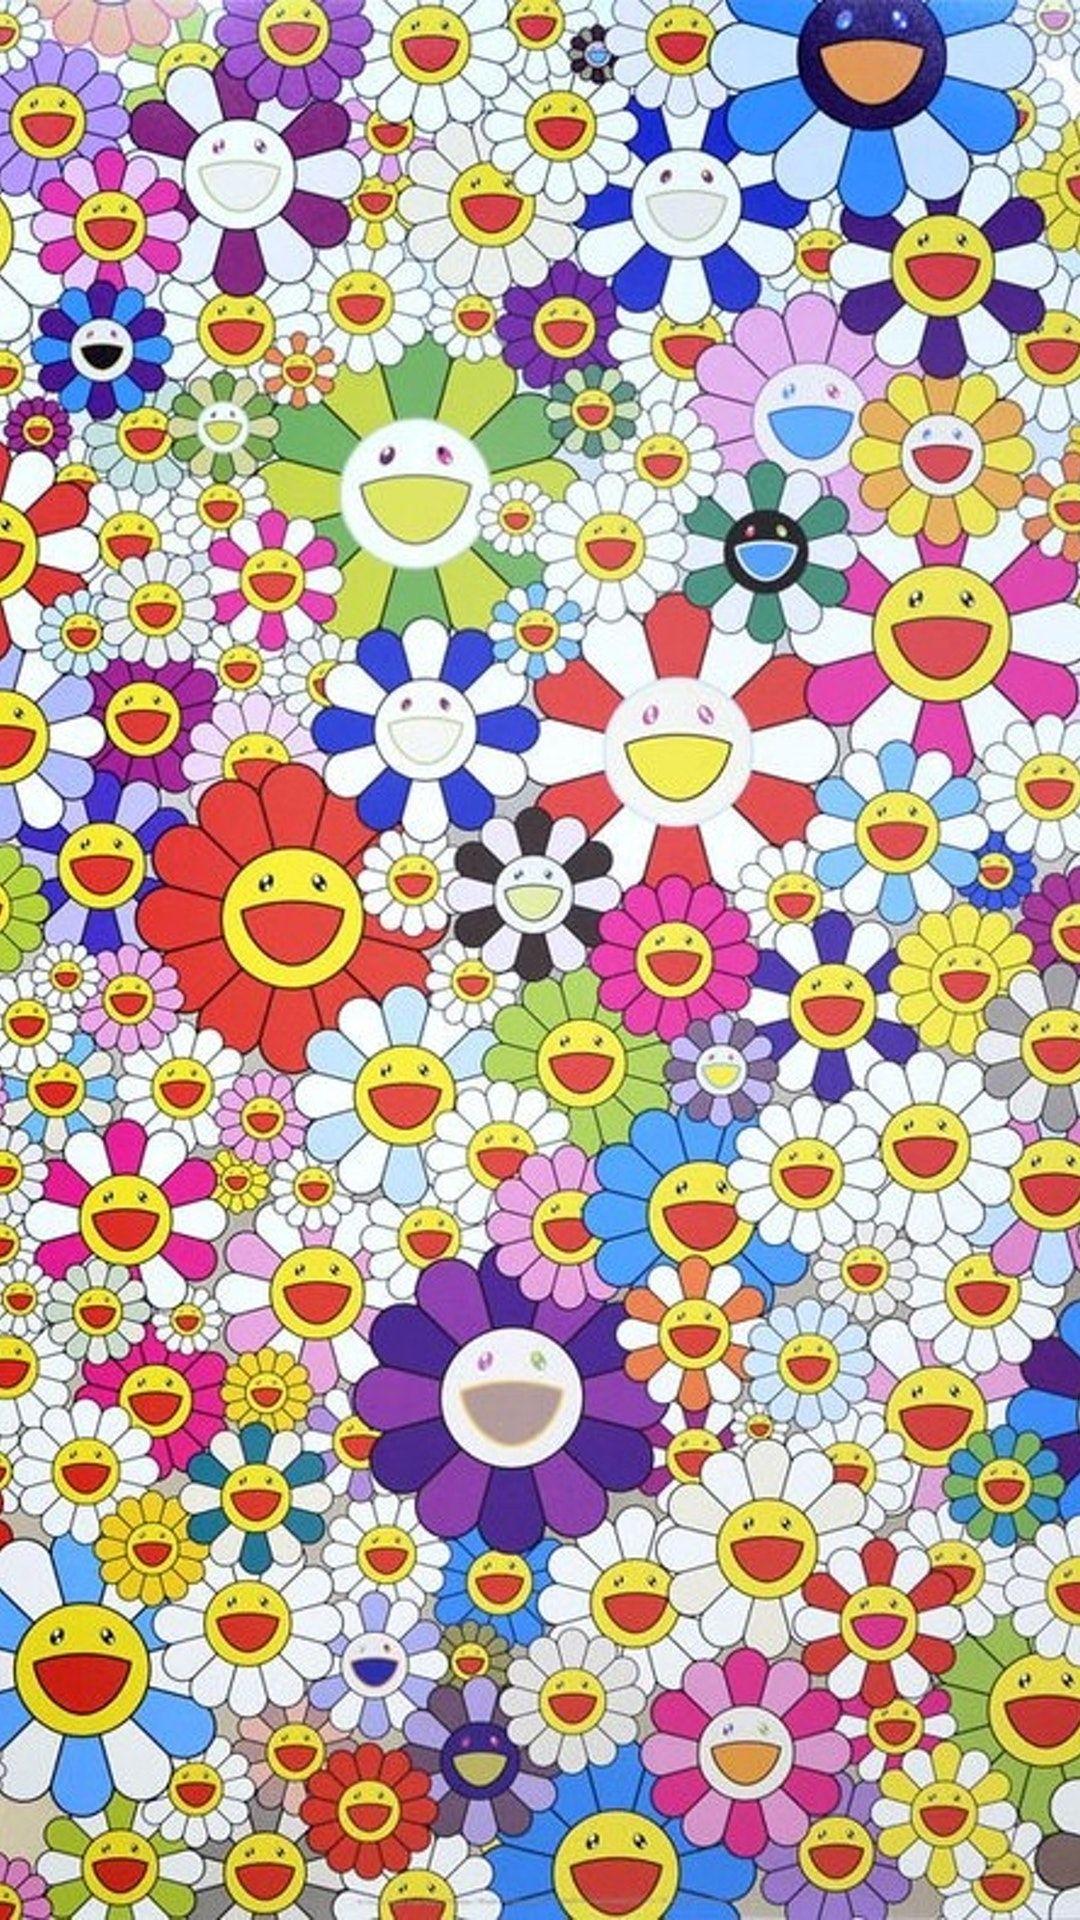 Takashi Murakami phone Wallpapers: 20+ Images - Wallpaperboat